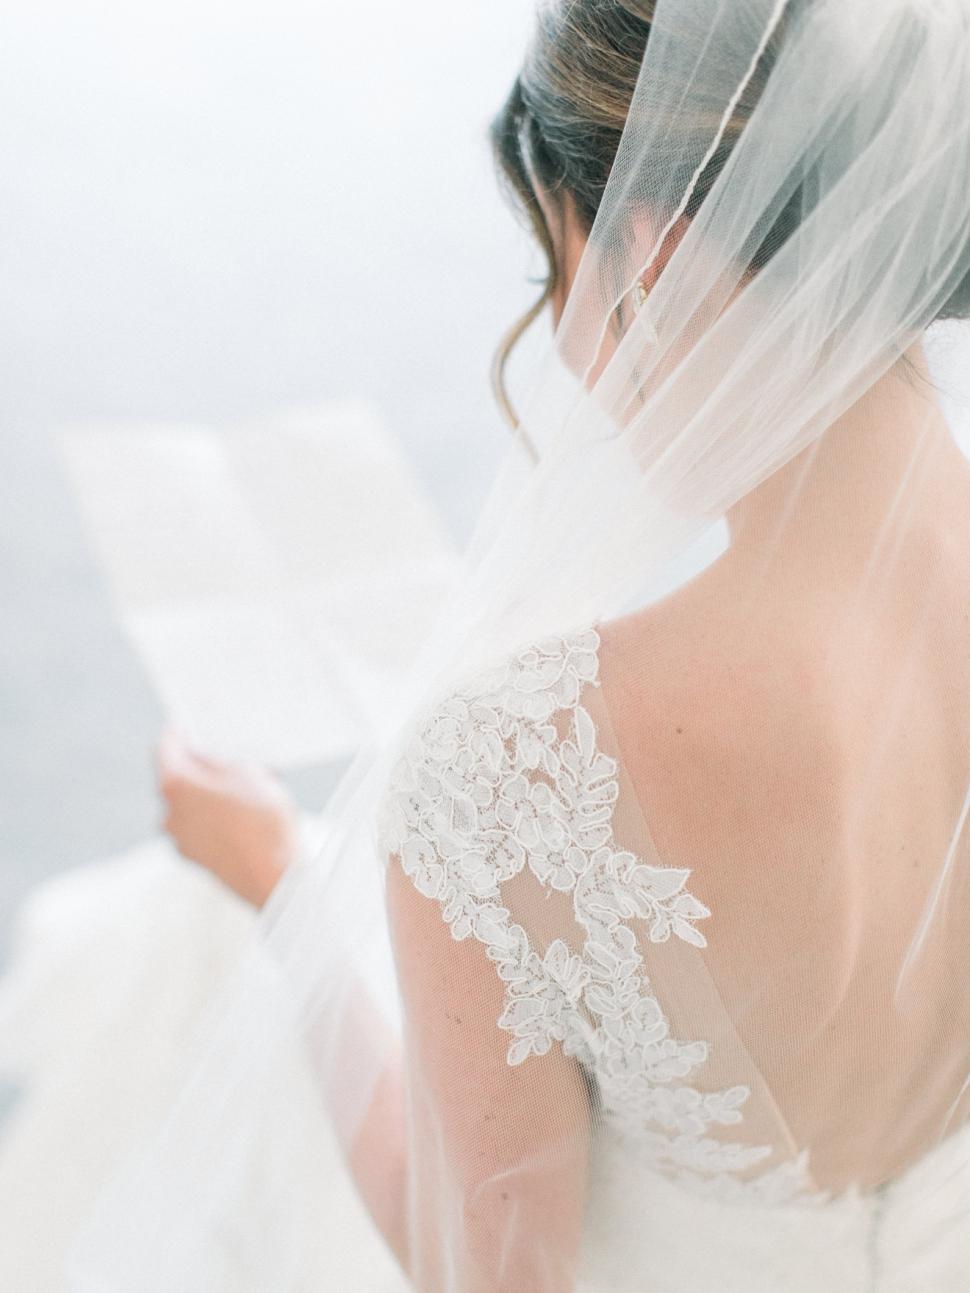 Connecticut-Wedding-Photographer-Cassi-Claire-Shorehaven-Golf-Club-Wedding_13.jpg